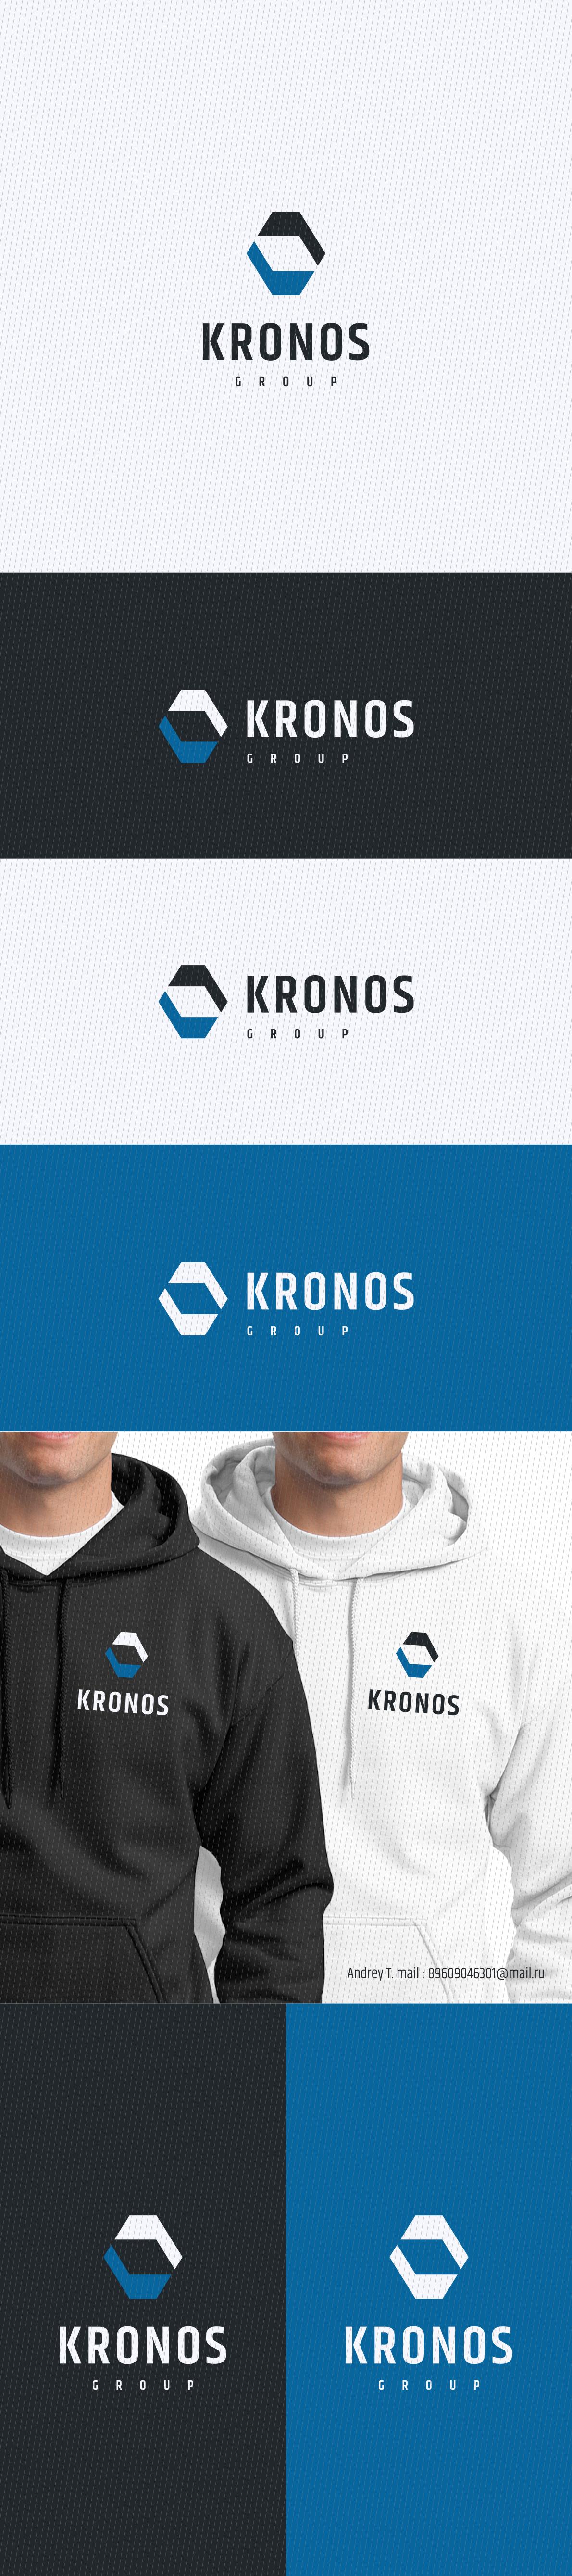 Разработать логотип KRONOS фото f_3805fb1d63e08388.png